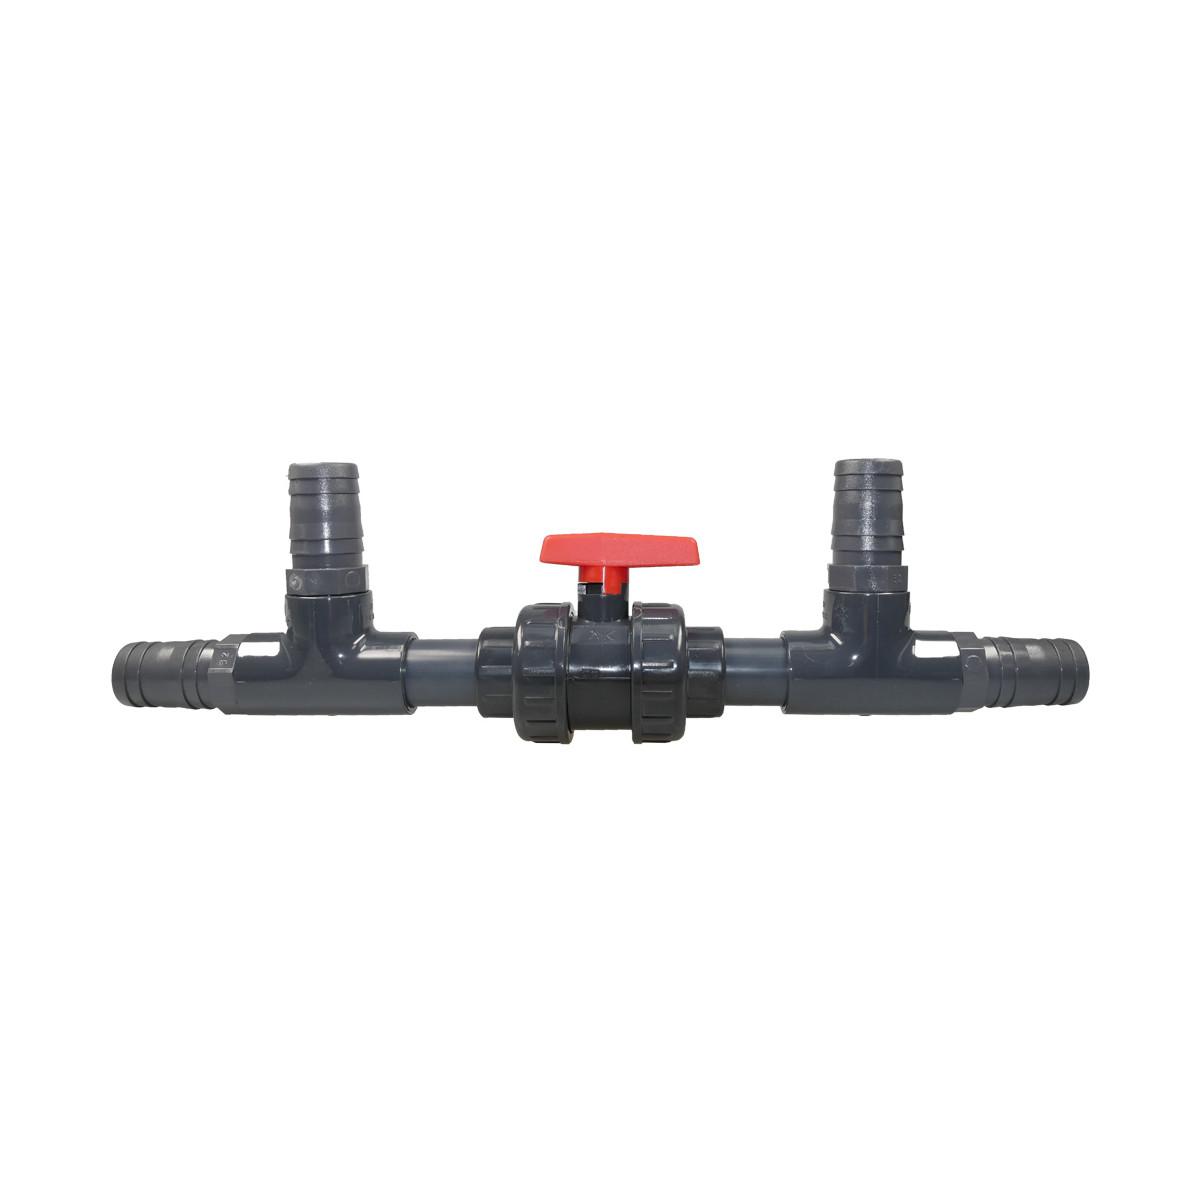 RST-VERSAND (Eigenmarke) Poolheizung Bypass Standard 32 x 32 mm